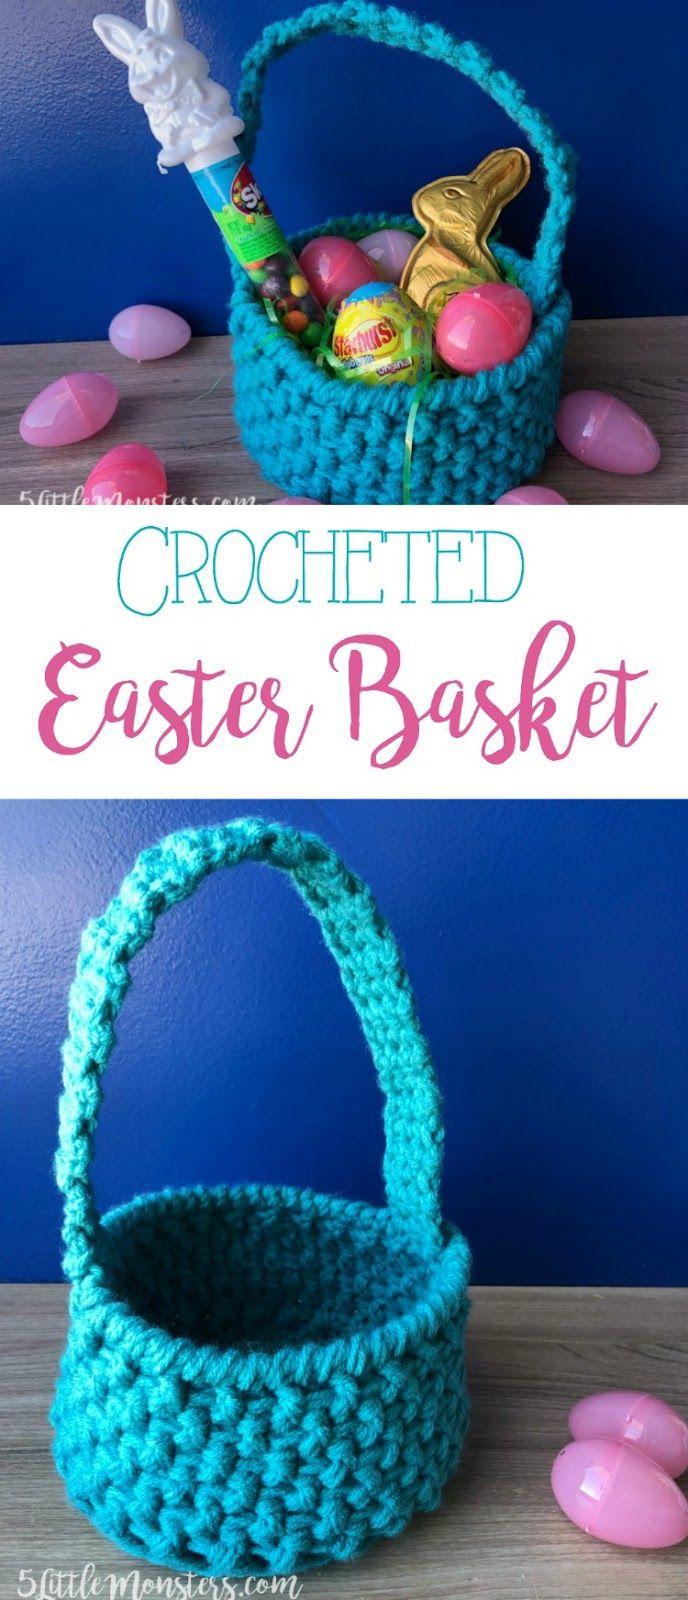 Free crochet Easter Basket pattern [ad] #sweetereaster @Walmart @Skittles @Starburst @DoveChocolateUSA